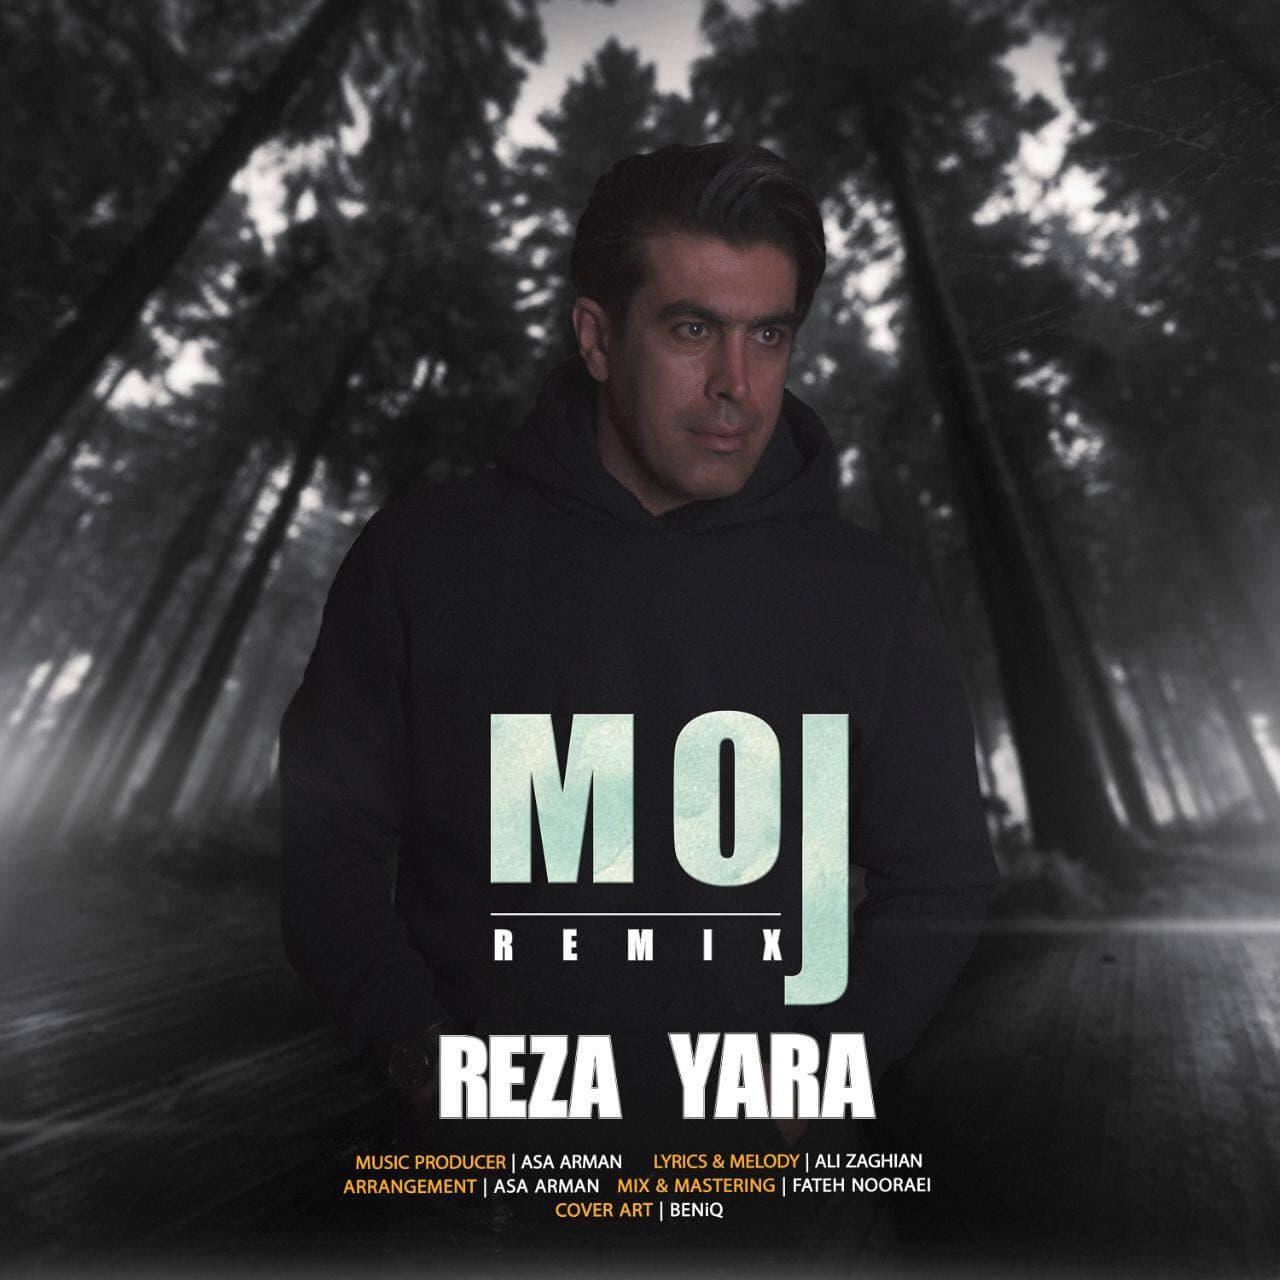 Reza Yara – Moj (Remix)